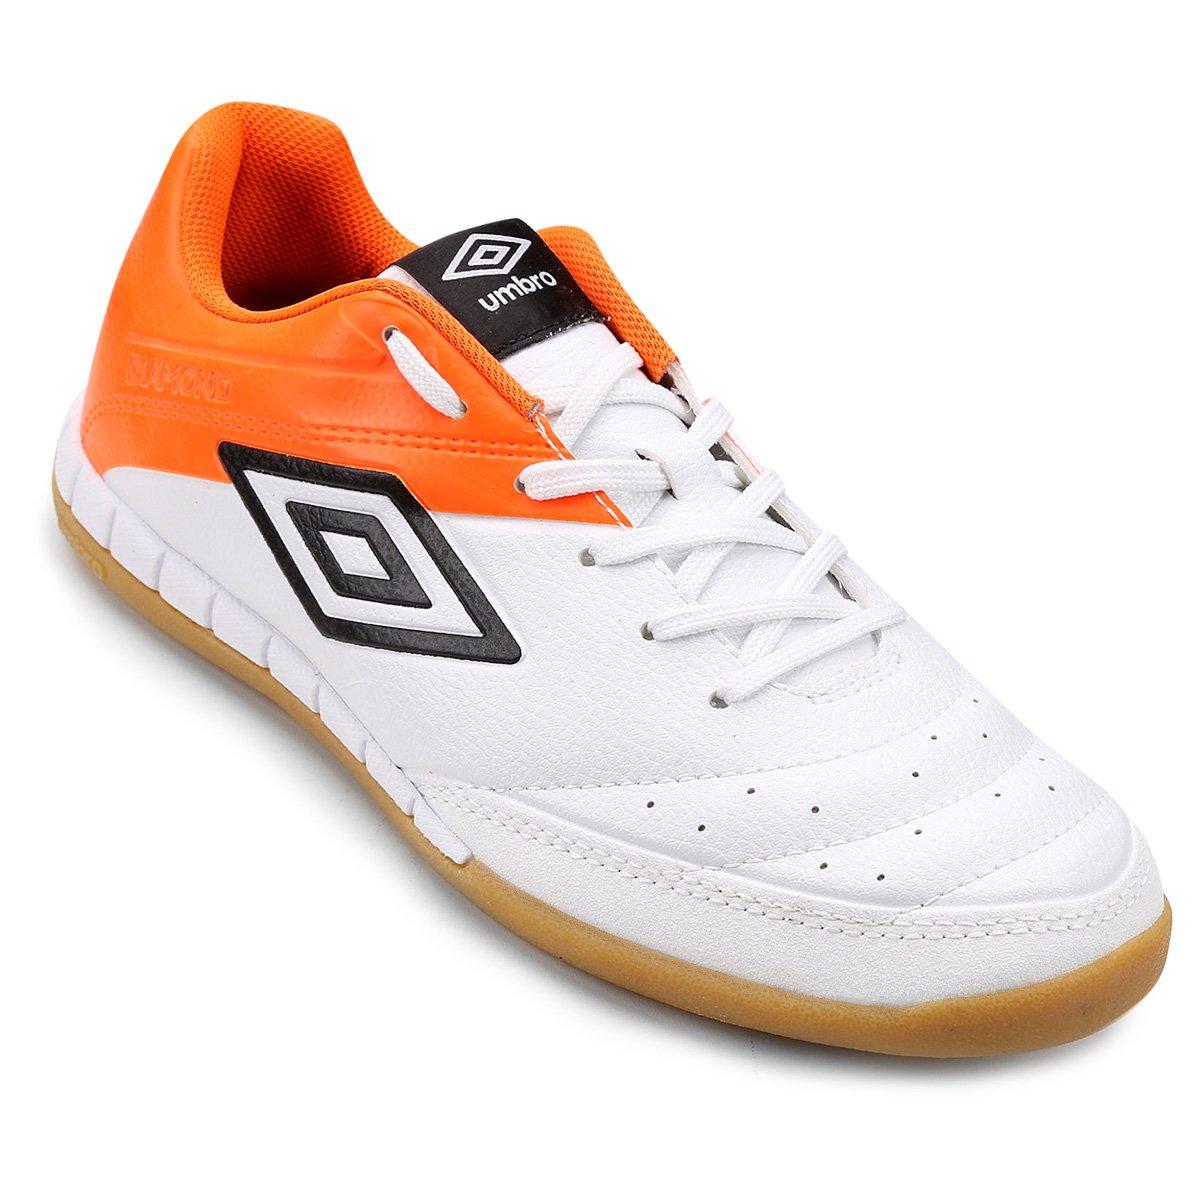 Chuteira Futsal Umbro Diamond 2 - Compre Agora  2d40ffc3862ec